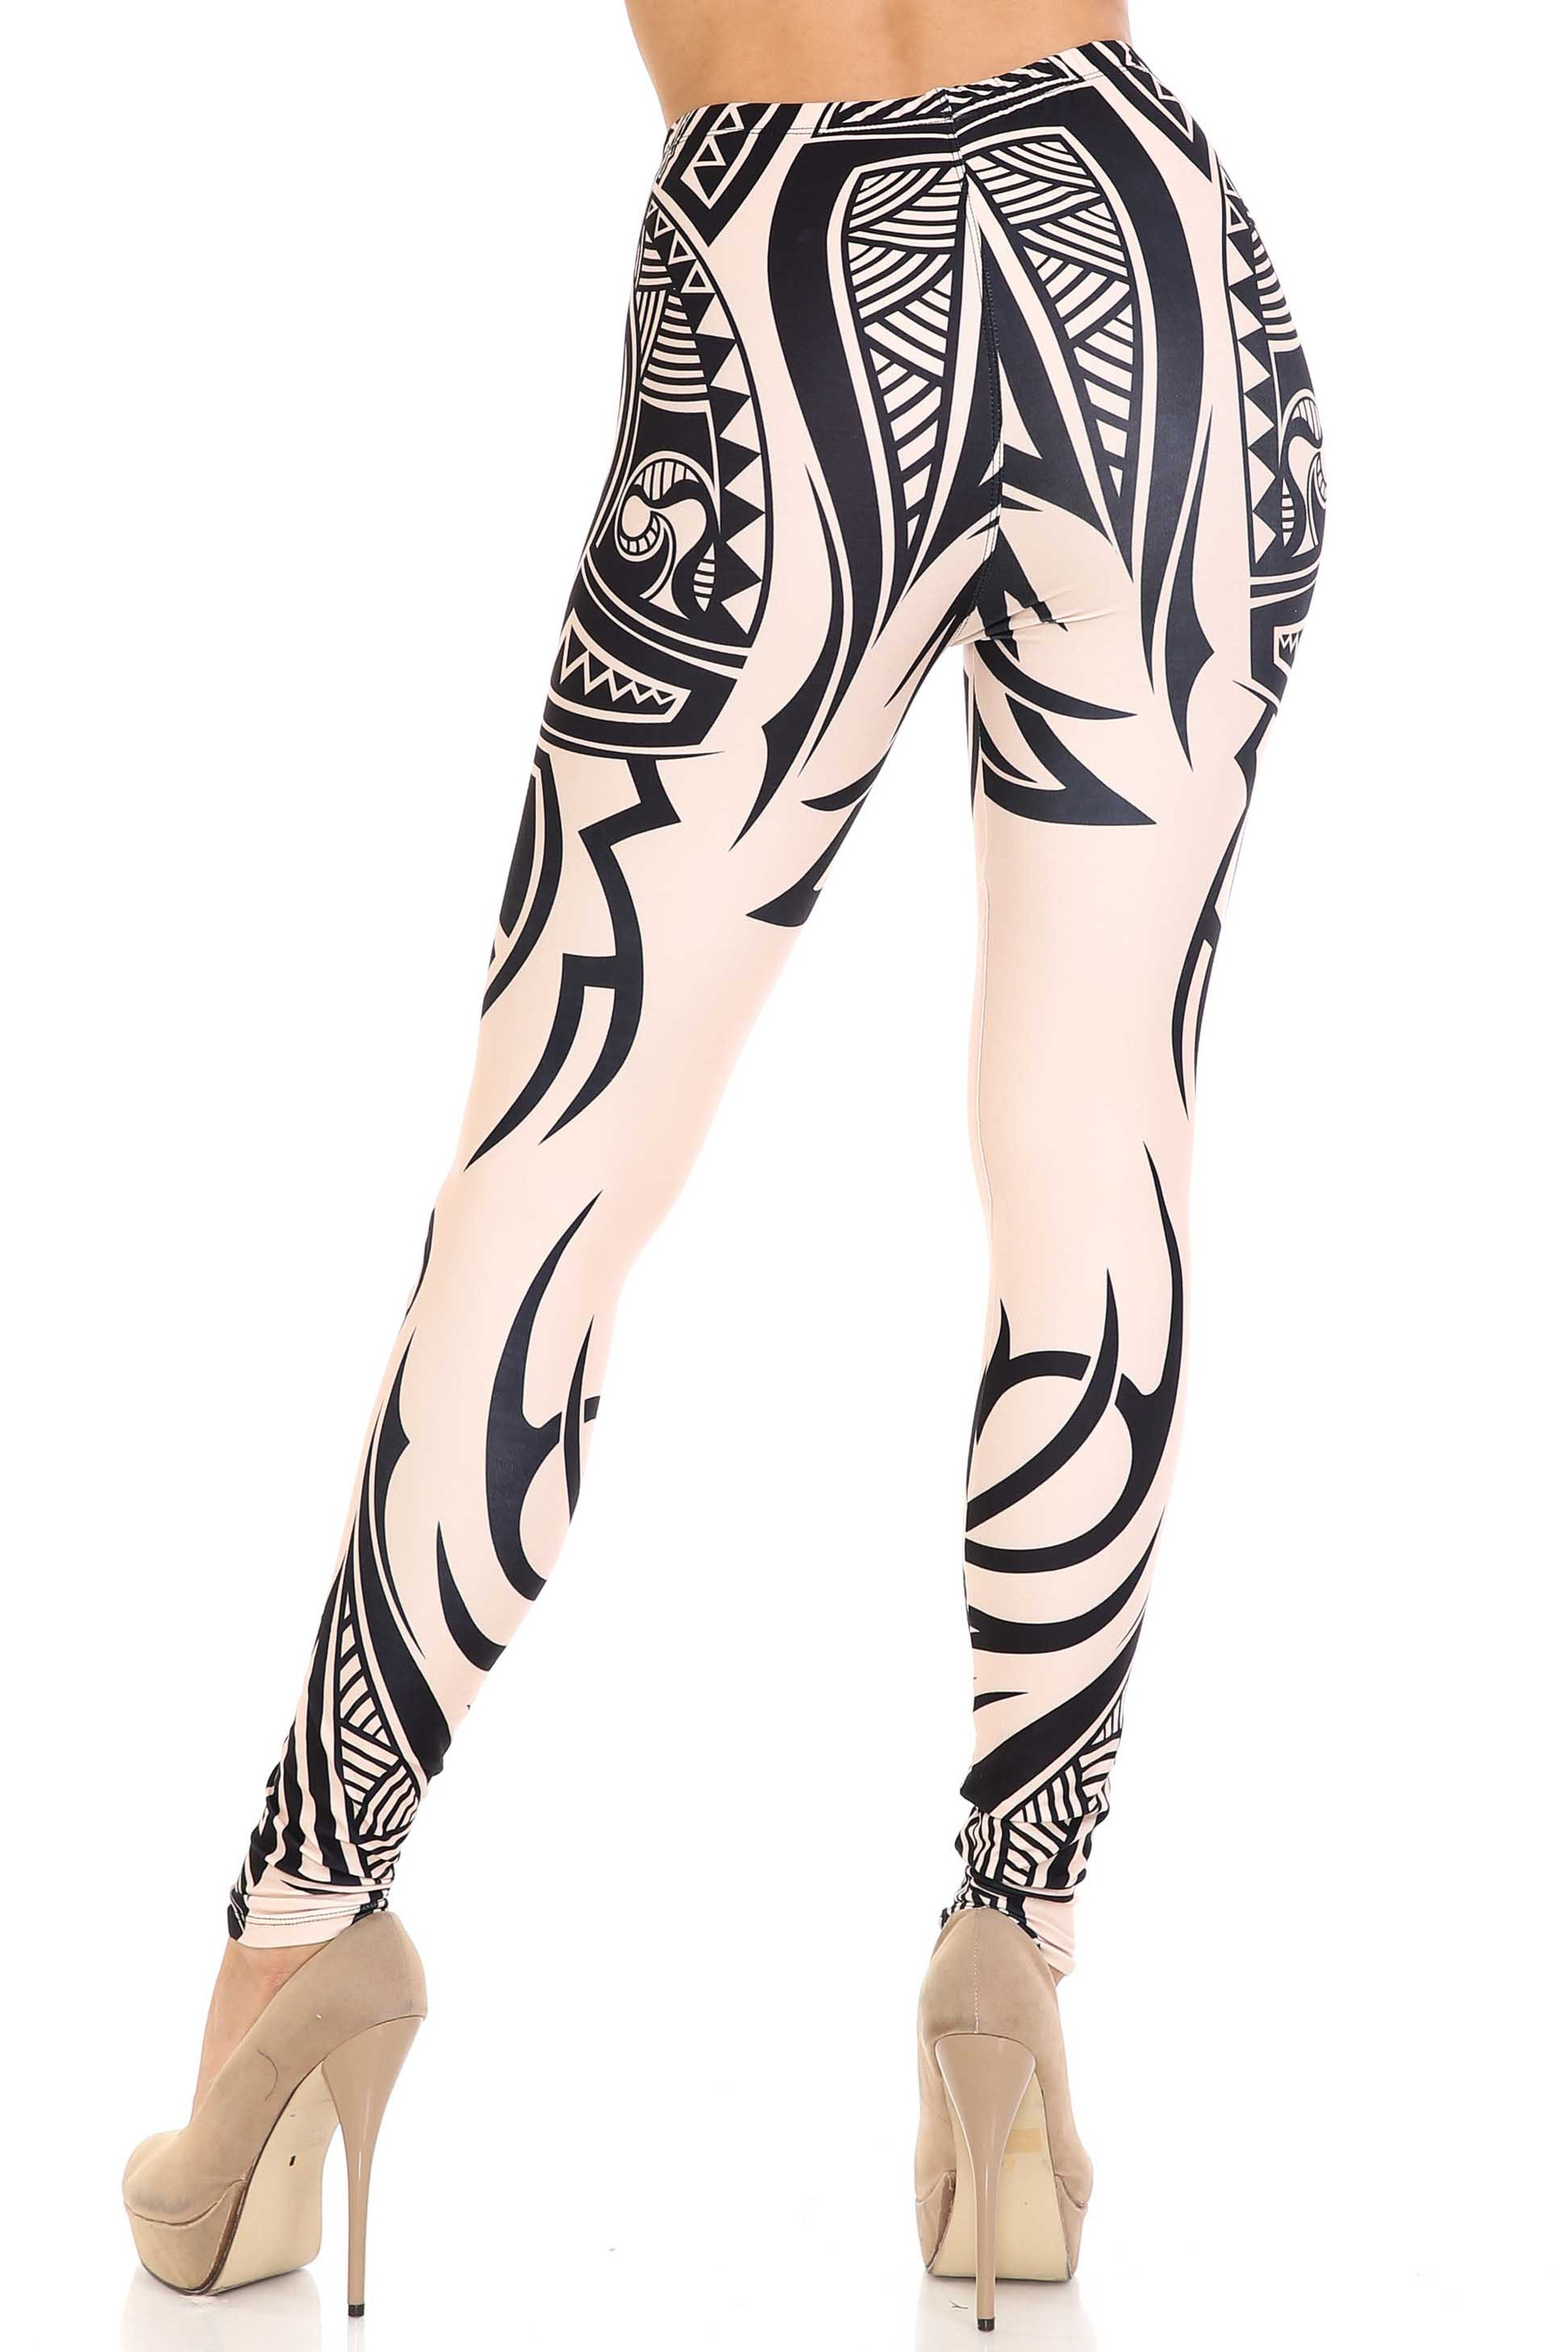 Creamy Soft Celestial Tribal Extra Plus Size Leggings - 3X-5X - USA Fashion™